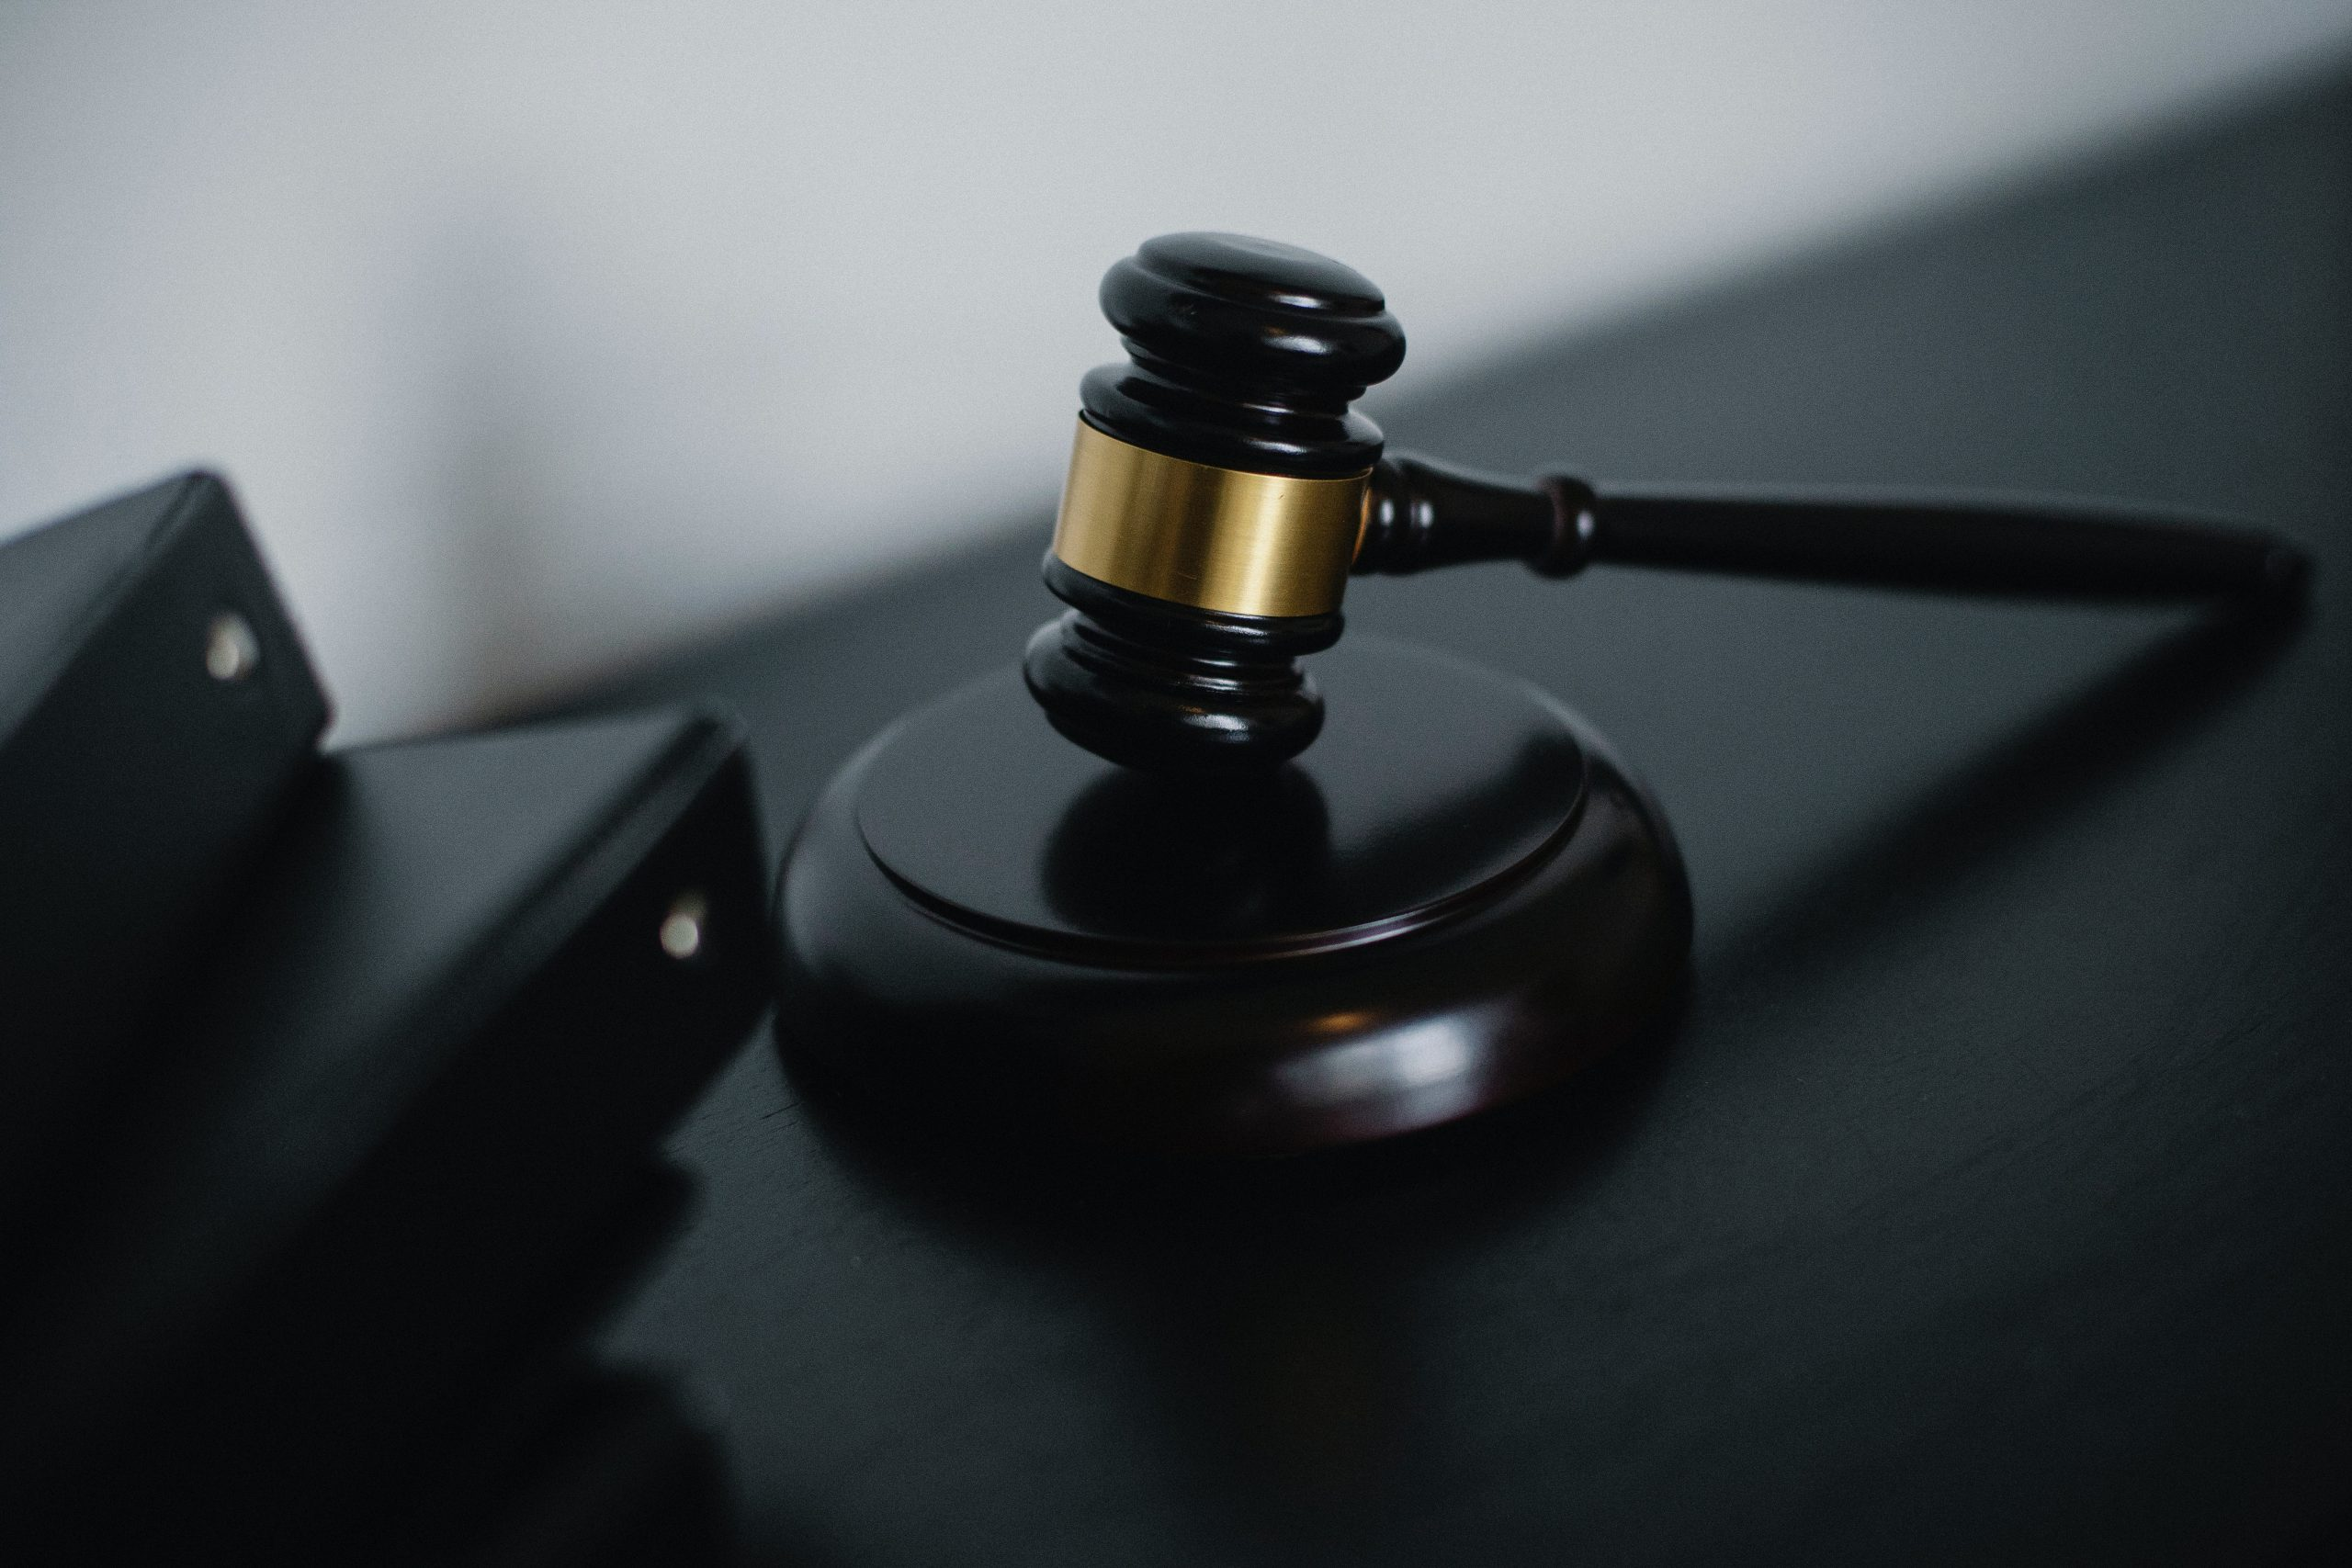 sentenza n° 18197 del 02.09.2020 testamenti